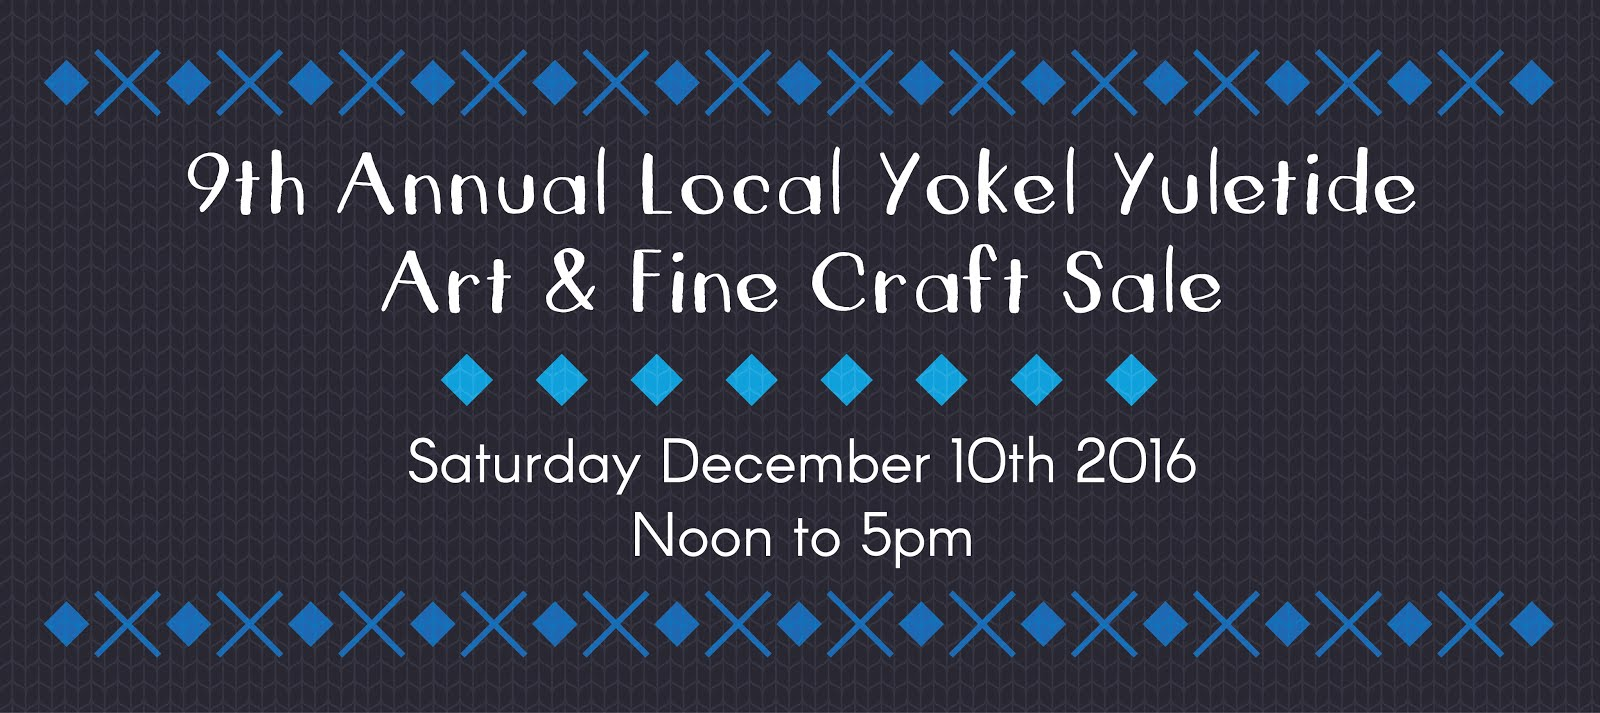 Local Yokel Yuletide Art & Craft Sale